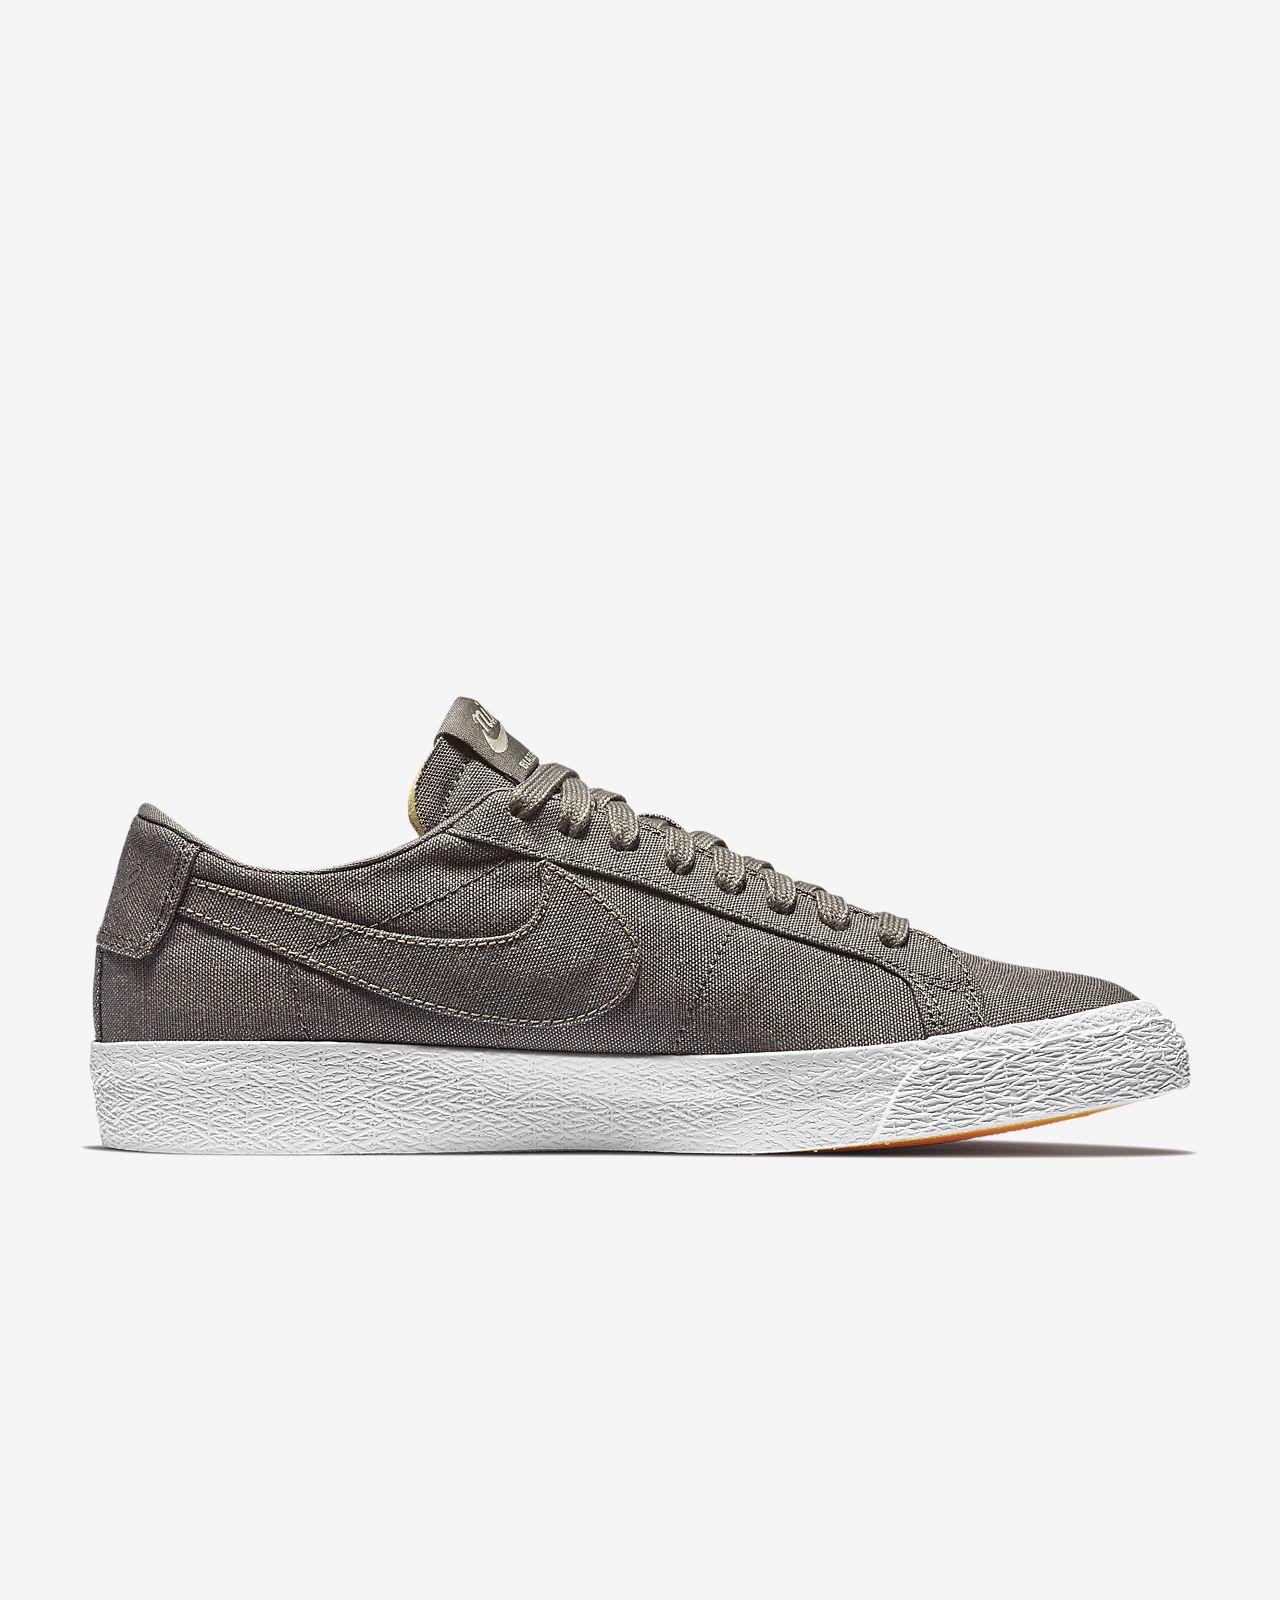 Nike SB Zoom Blazer Low Canvas Deconstructed Men's Skateboarding Shoe